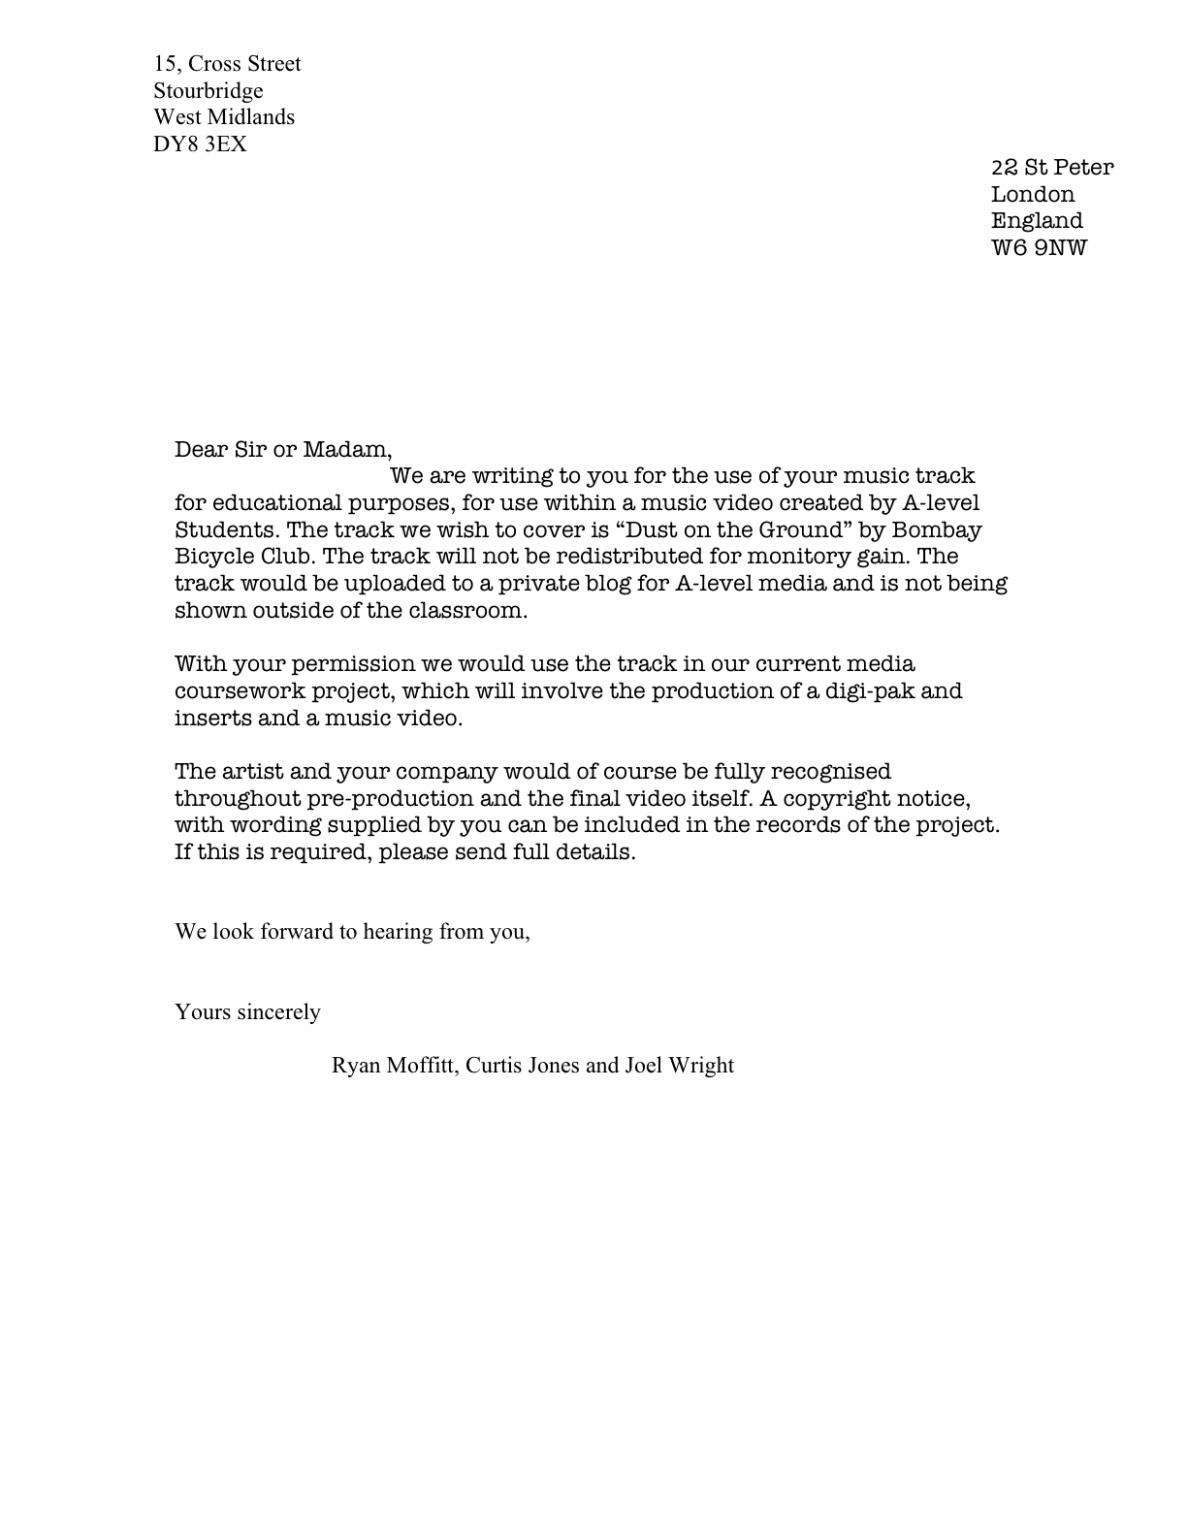 11 Format Letter Video in 2020 Business letter format